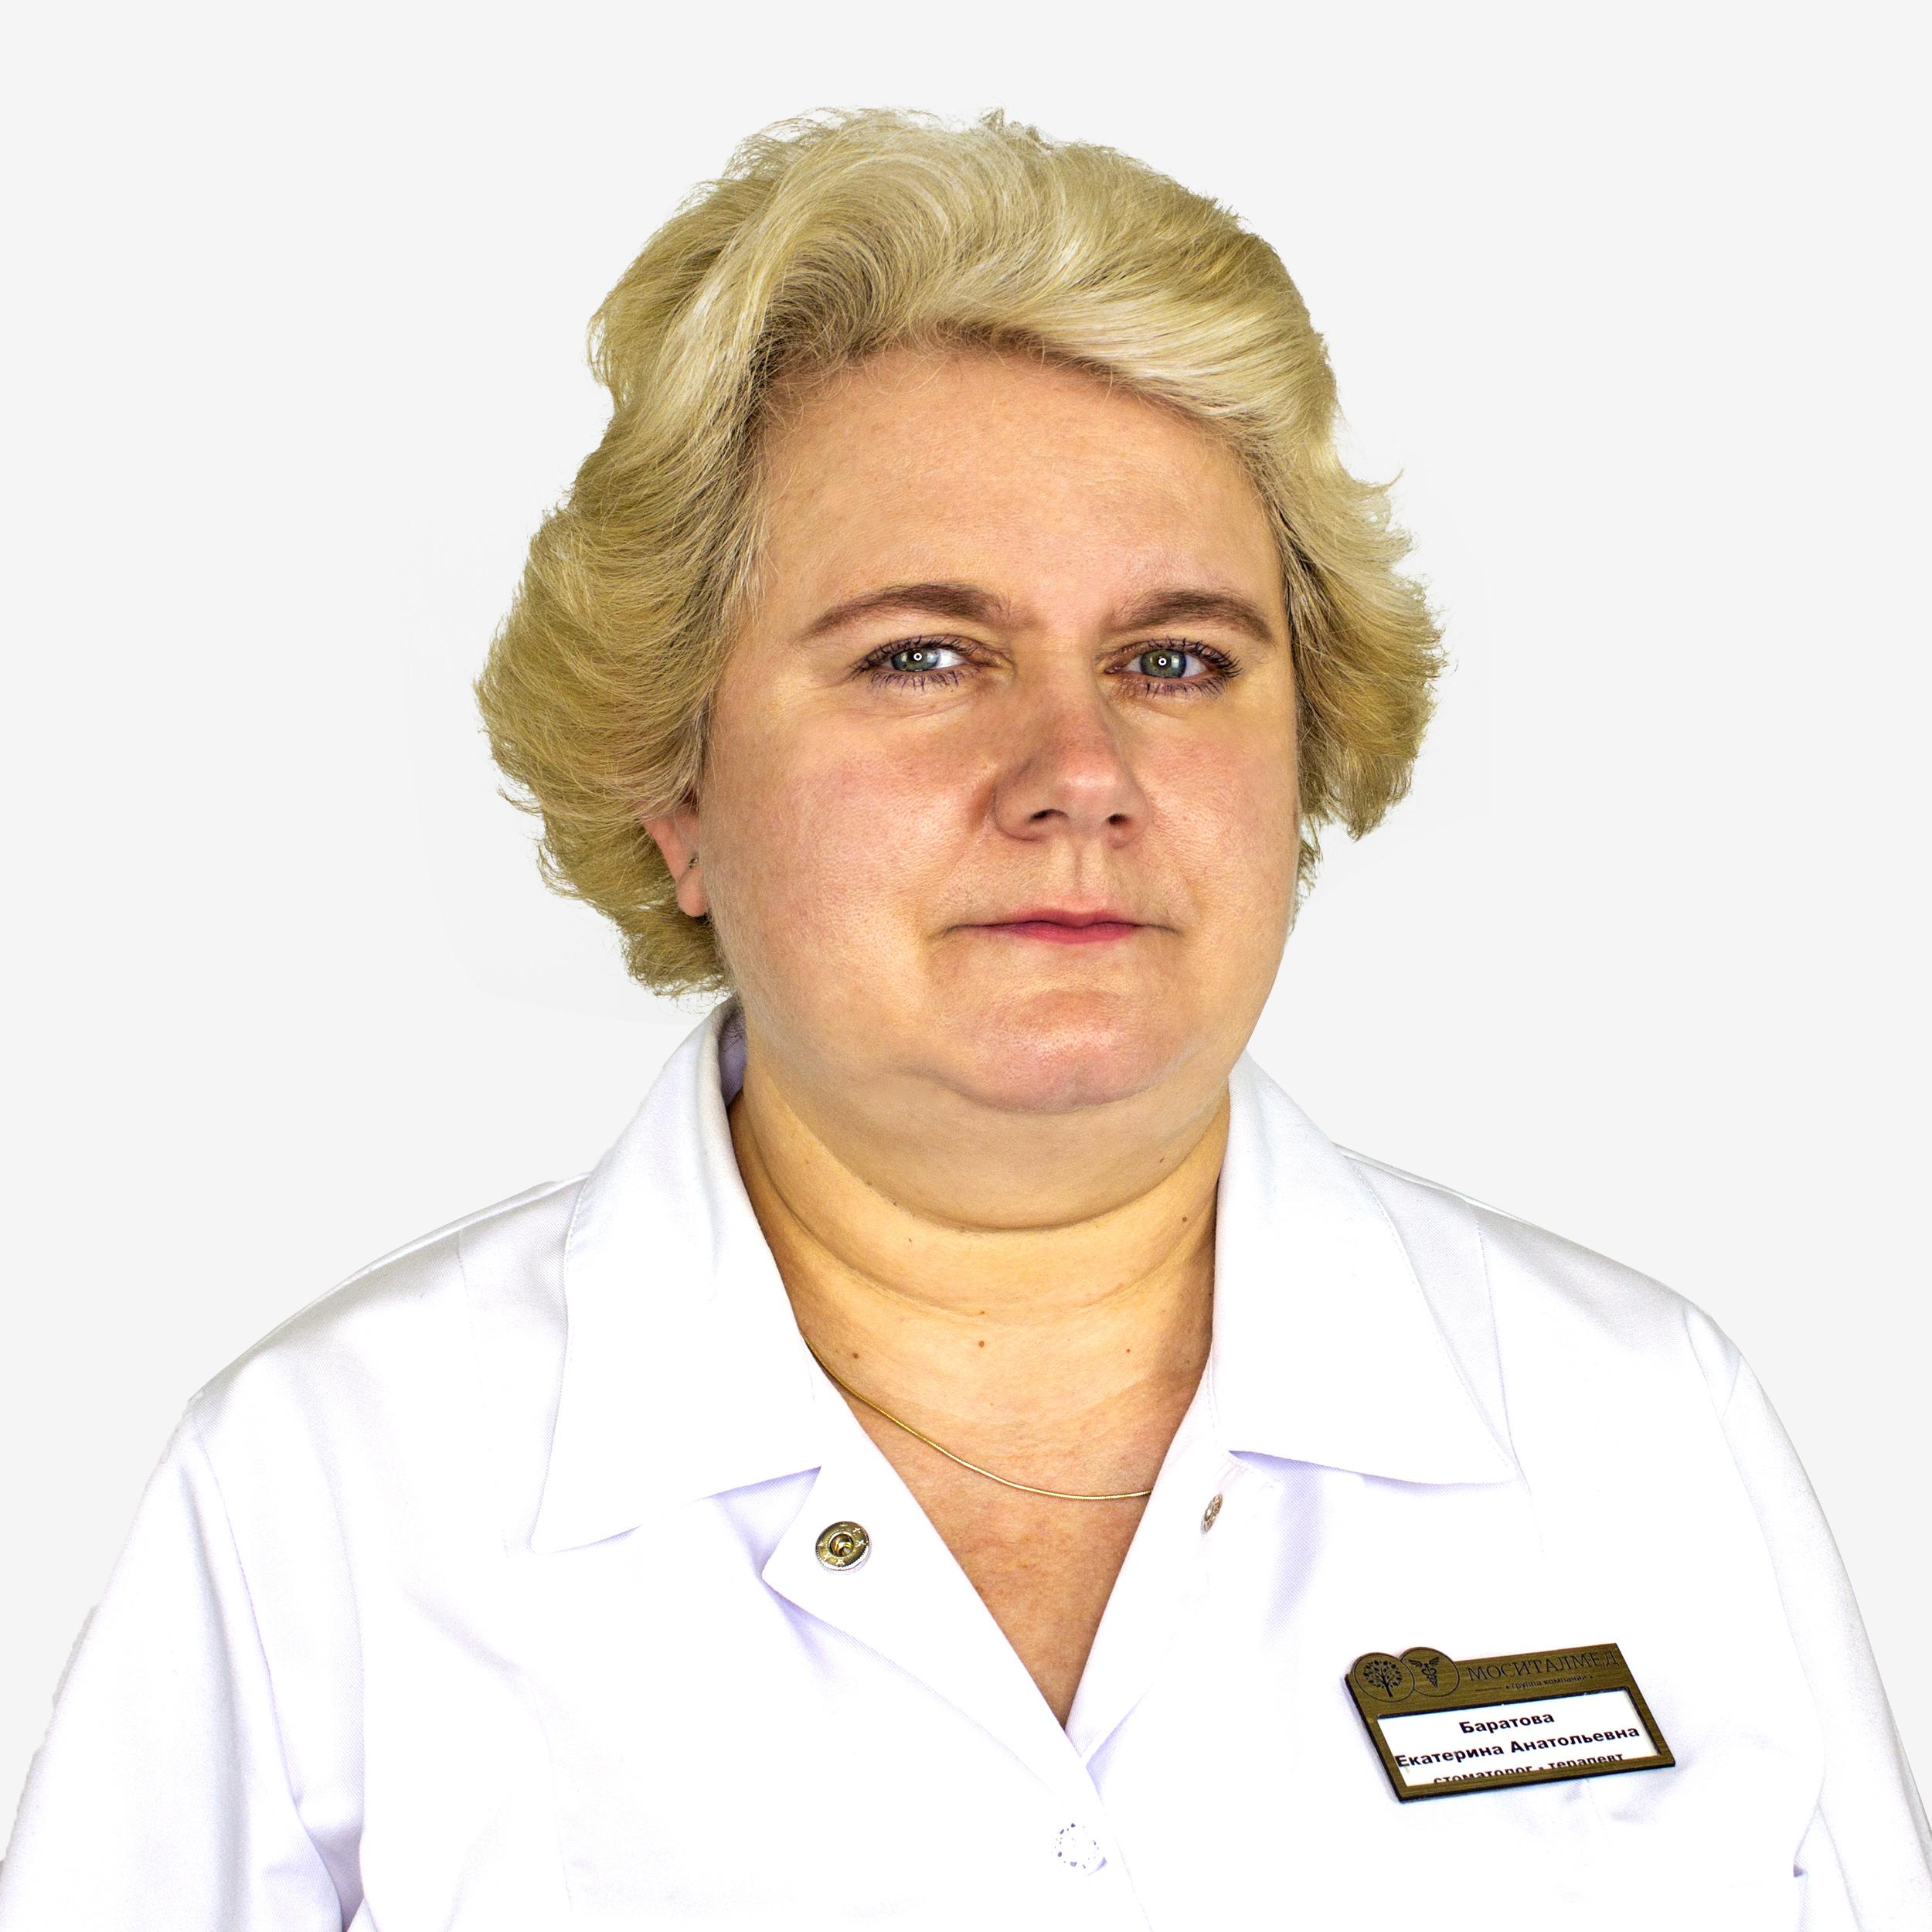 Баратова Екатерина Анатольевна